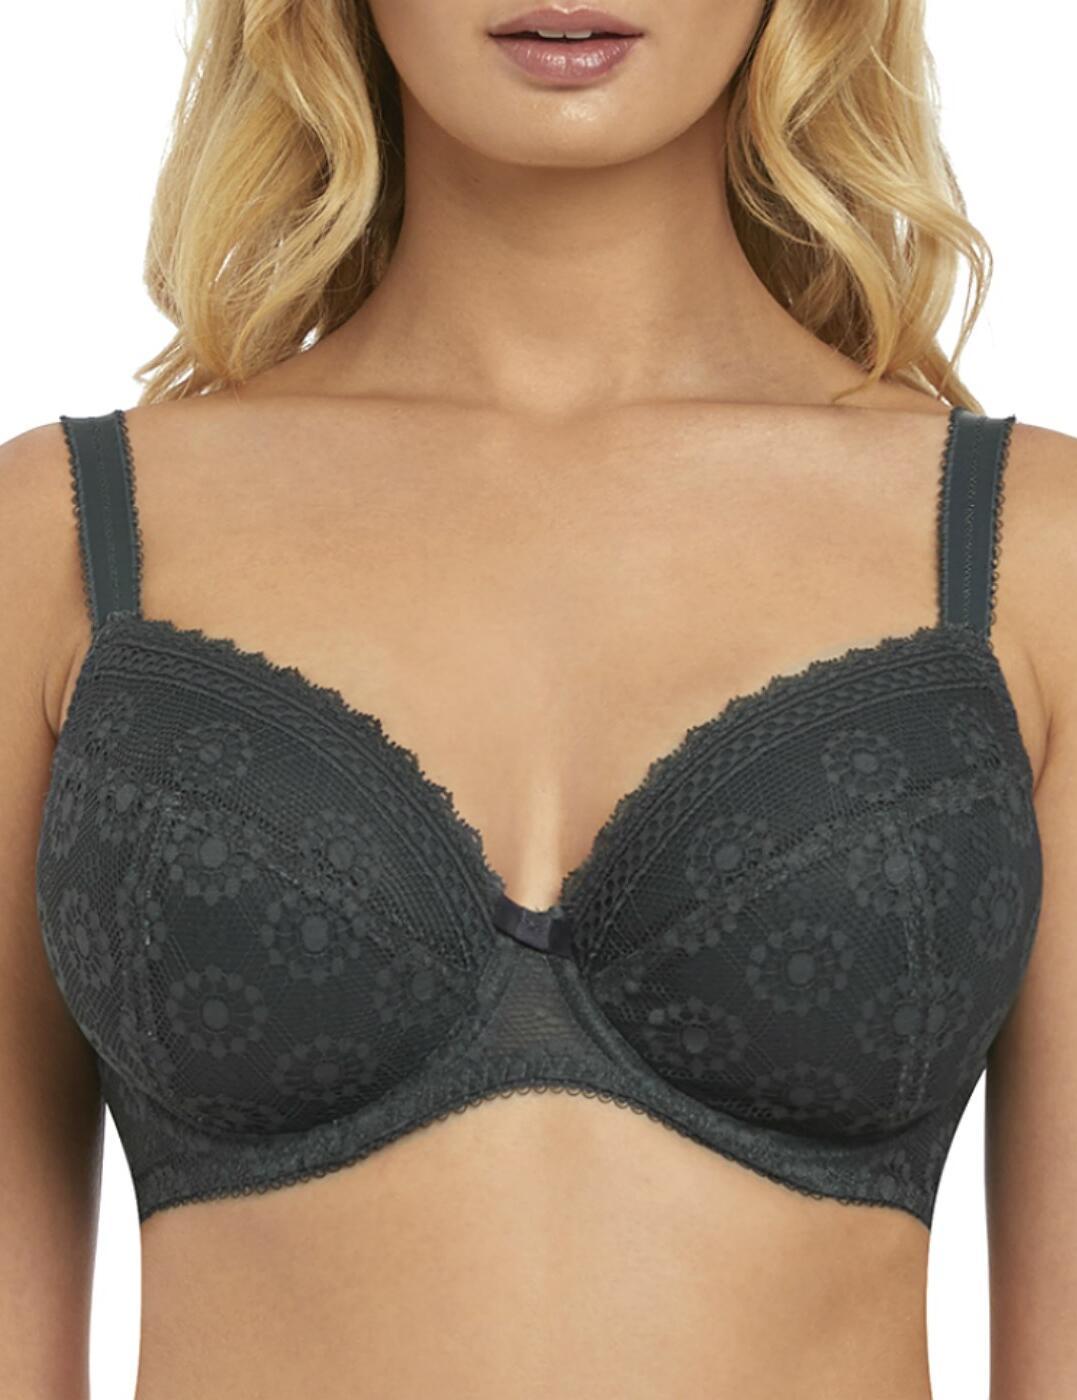 Freya Love Note Plunge Bra 5213 Womens Padded Bras New Lingerie Slate Grey